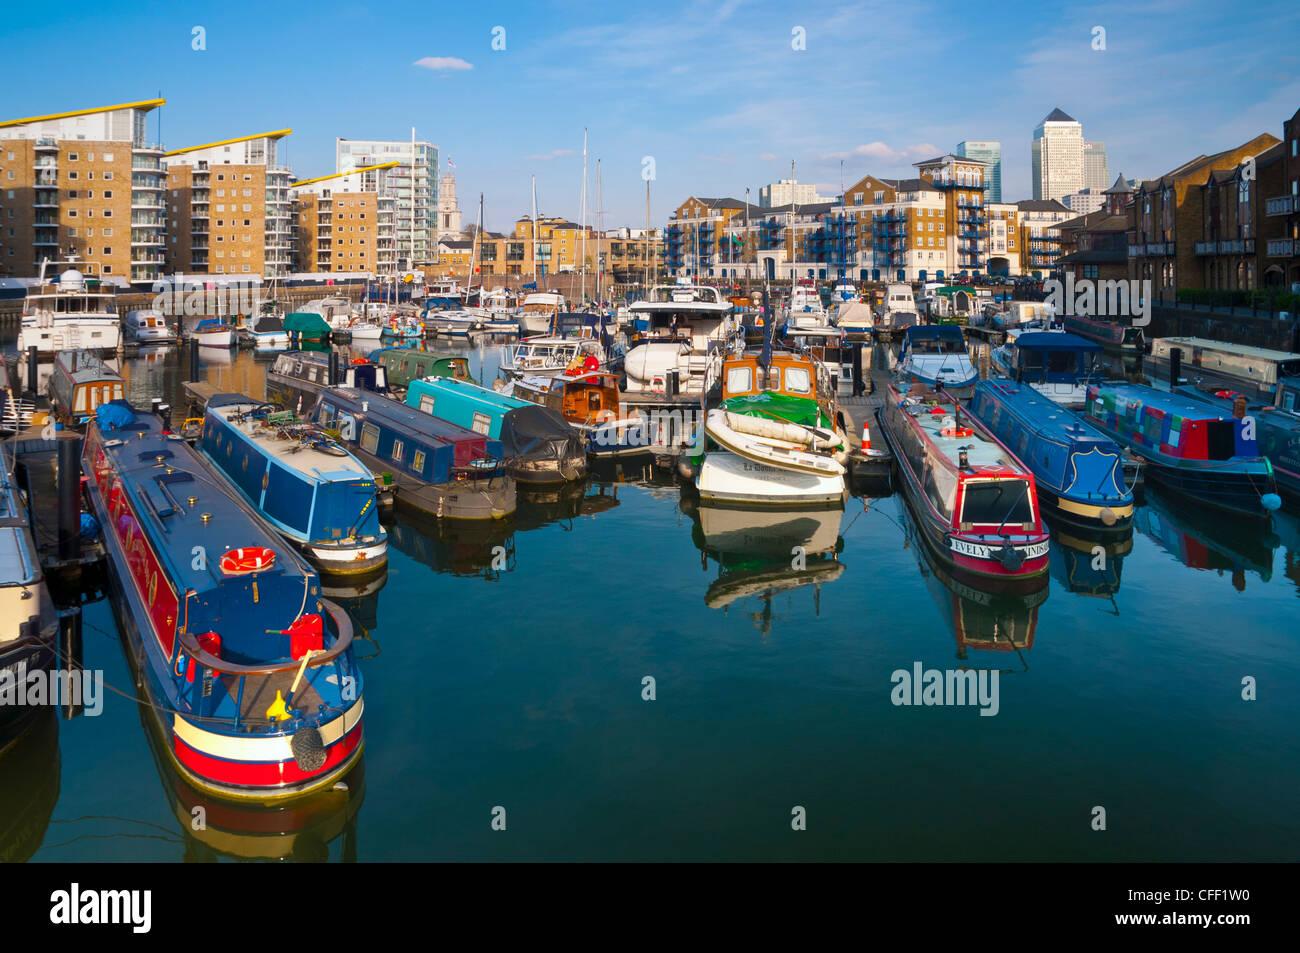 Limehouse Basin and Canary Wharf beyond, London, England, United Kingdom, Europe - Stock Image